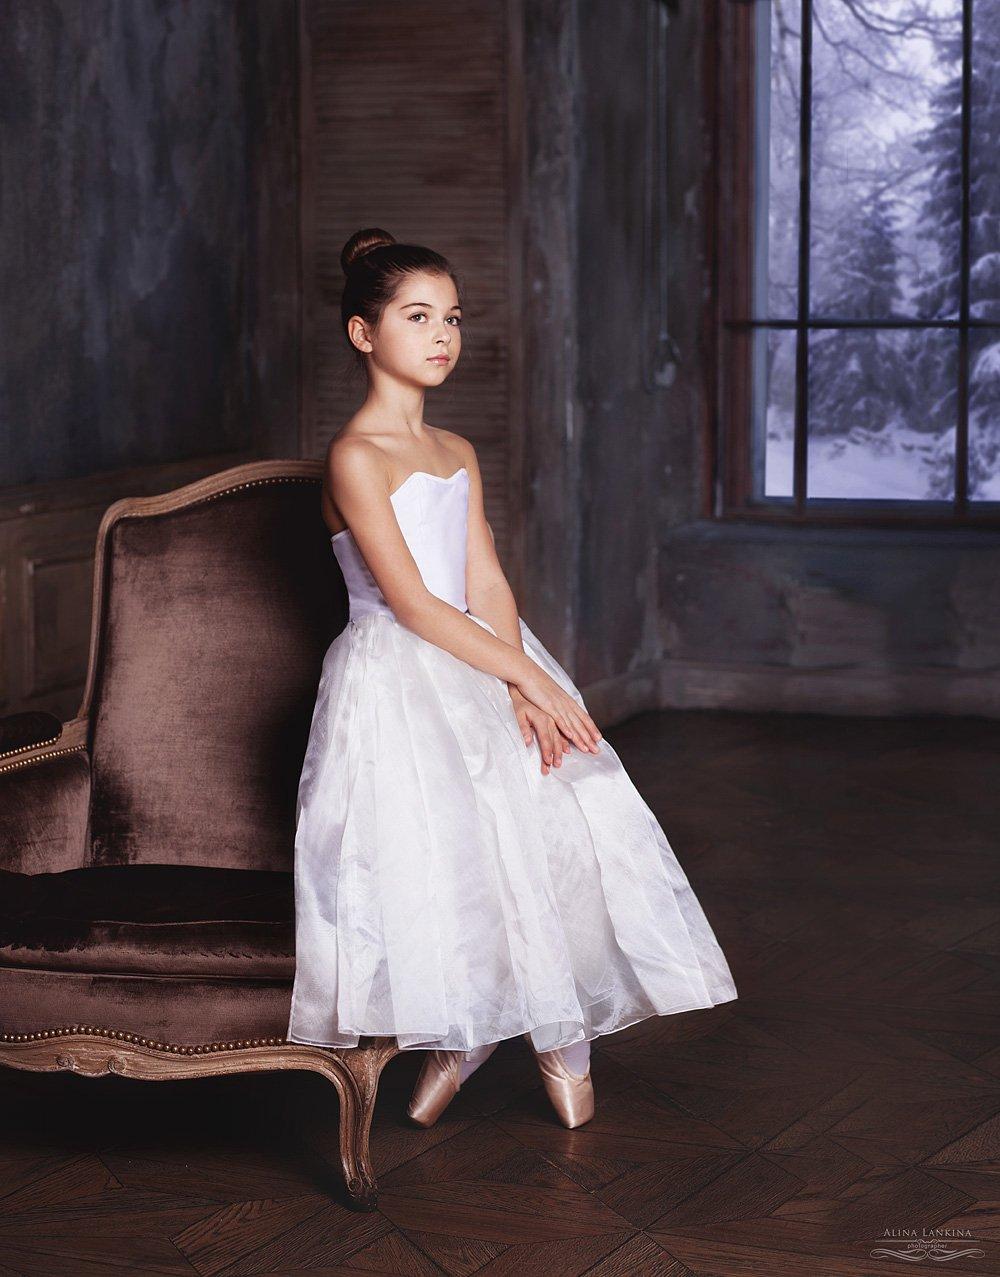 портрет, балет, девочка, ребенок, Alina Lankina